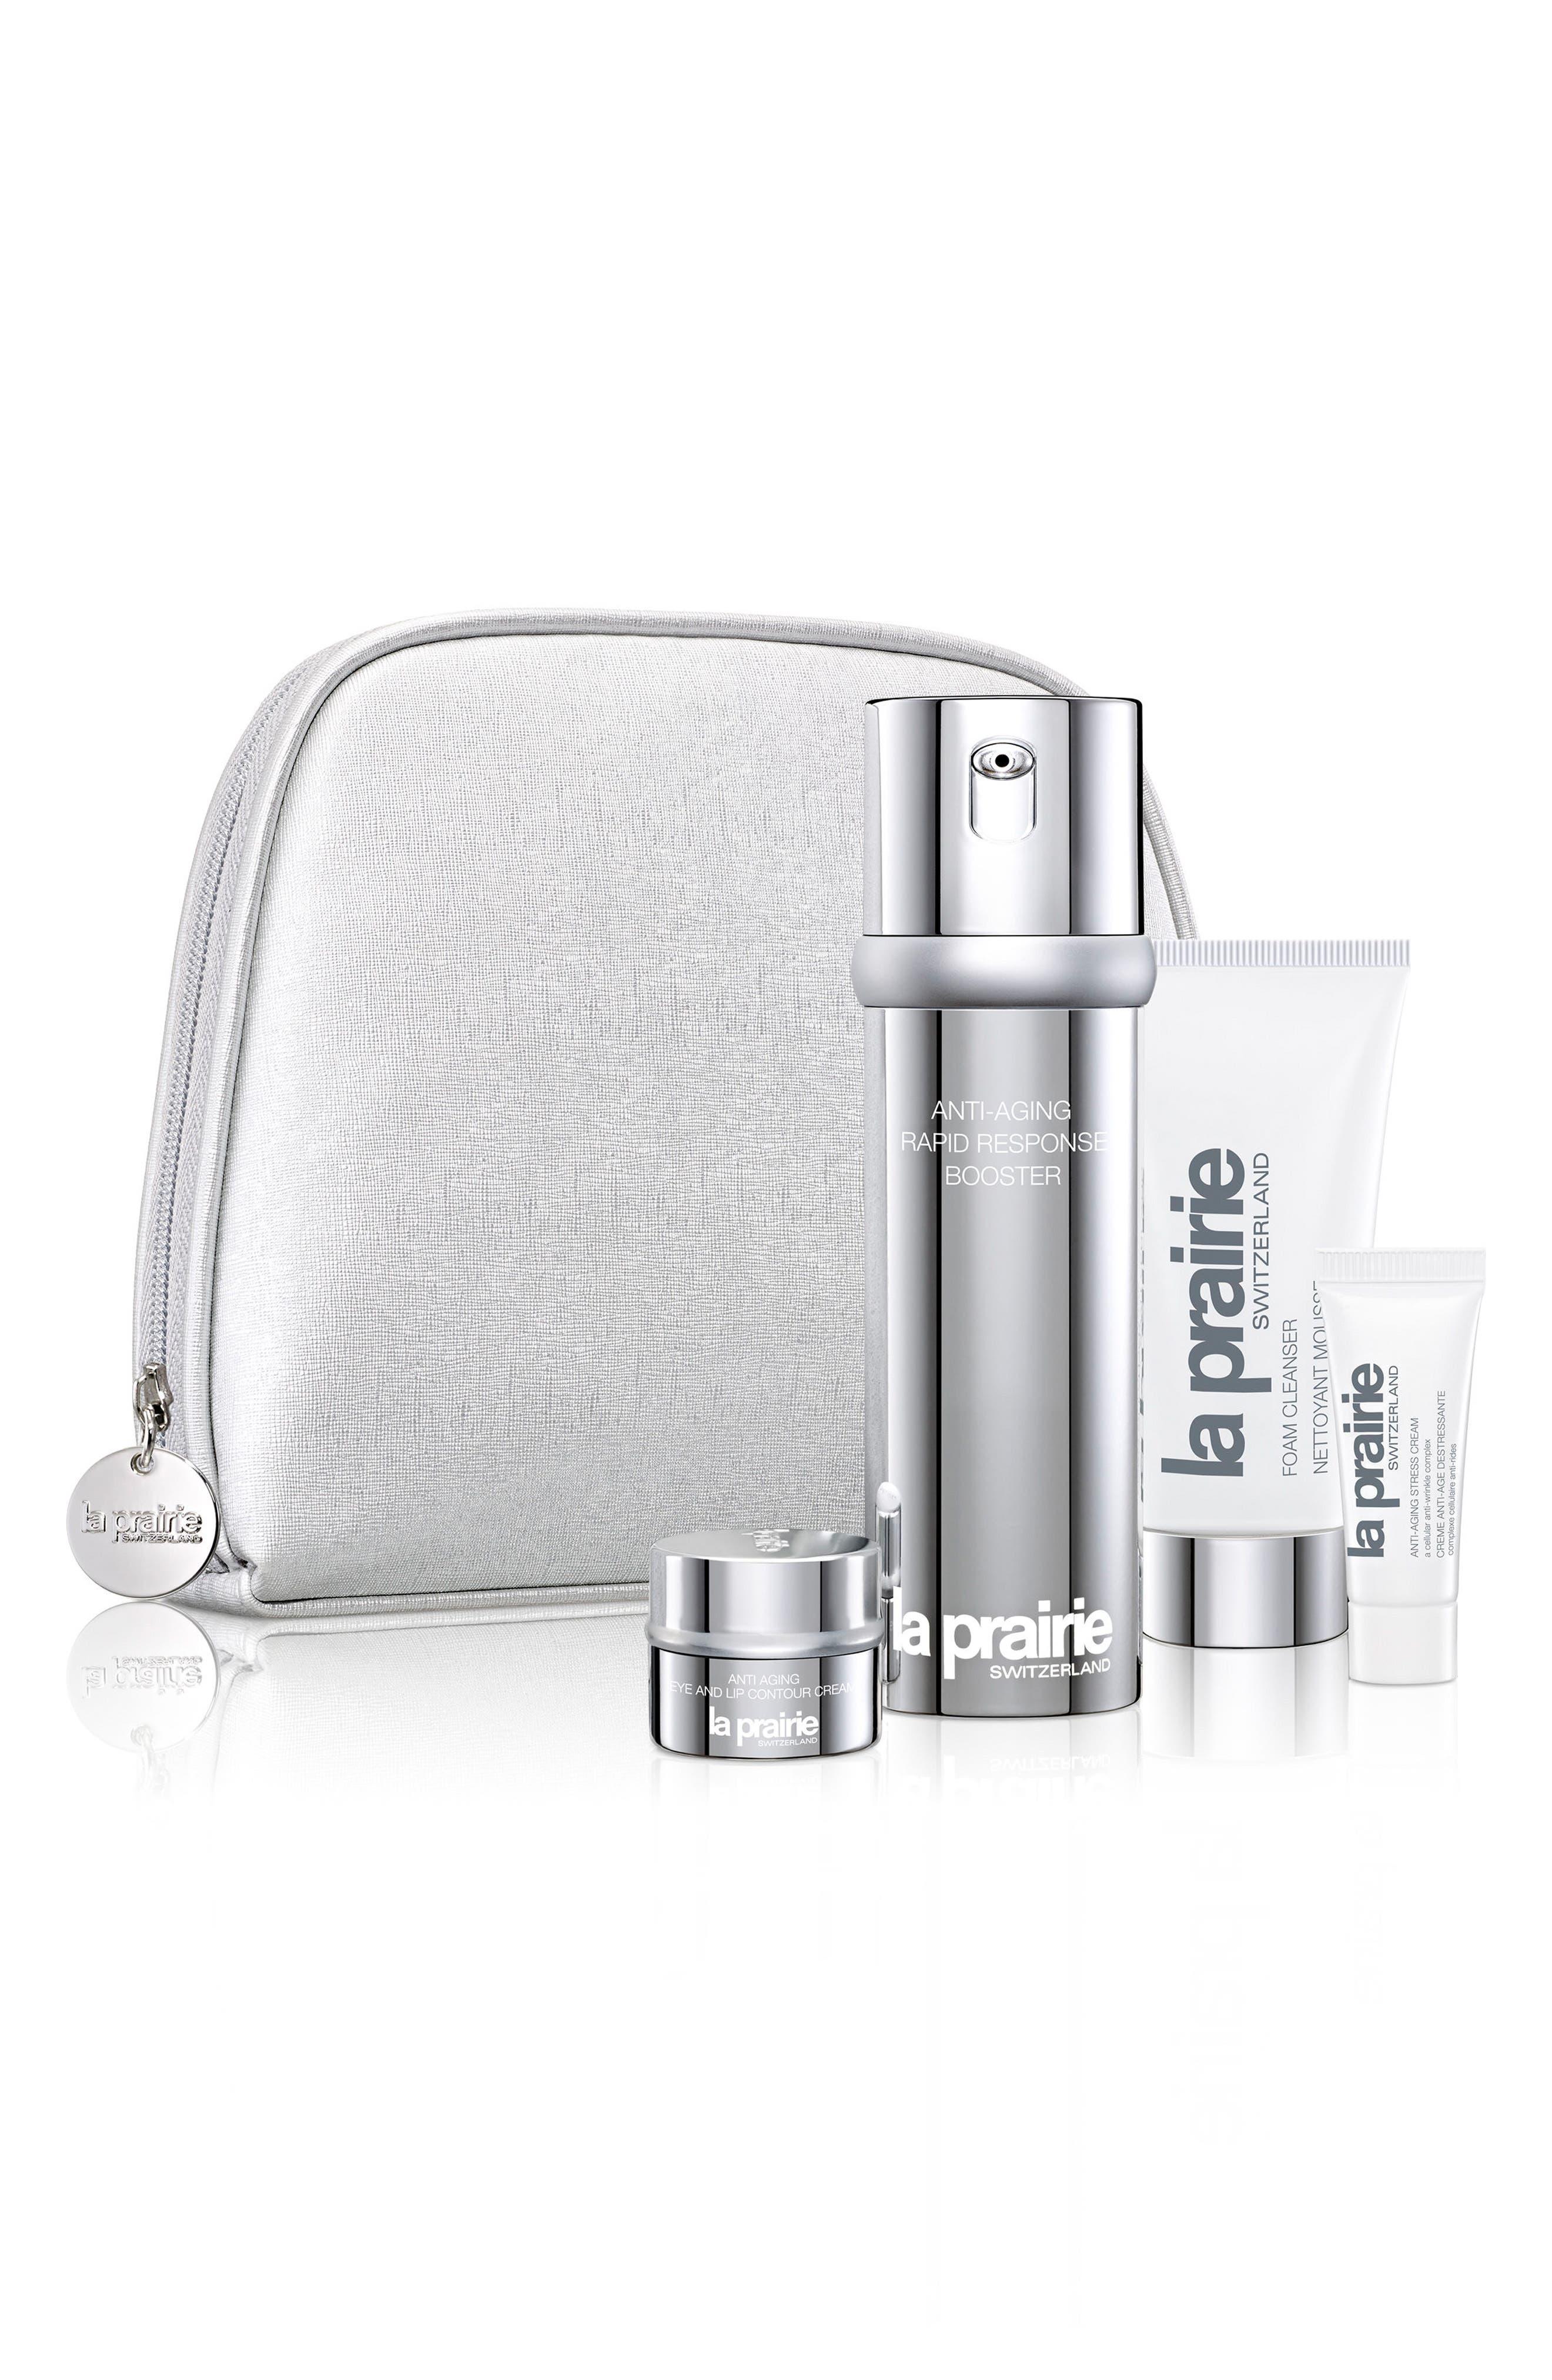 Main Image - La Prairie Anti-Aging Essentials Set (Limited Edition) ($385 Value)